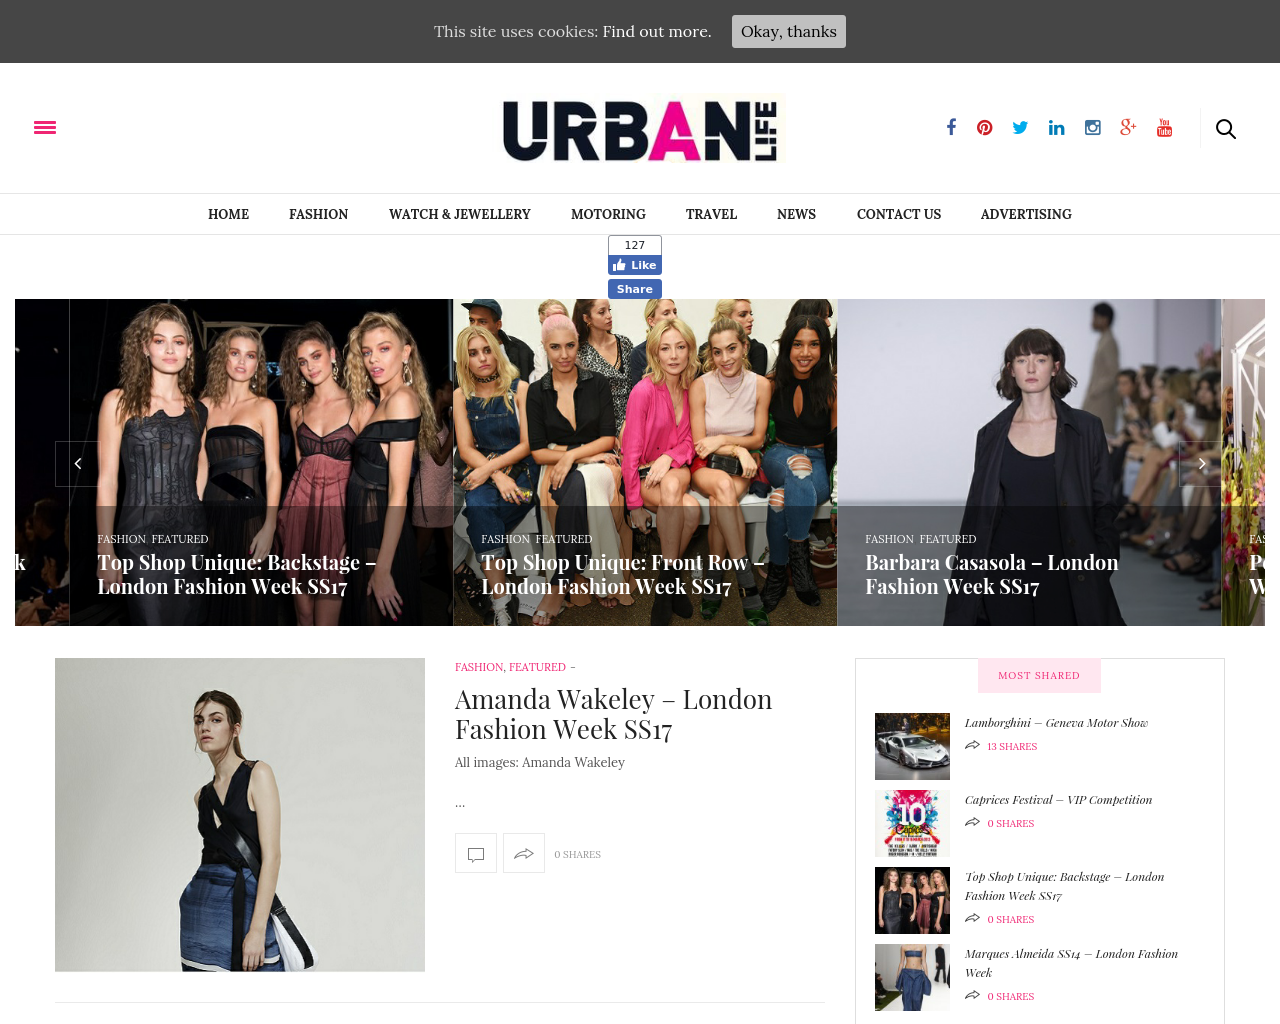 Urban-Life-Magazine-Advertising-Reviews-Pricing